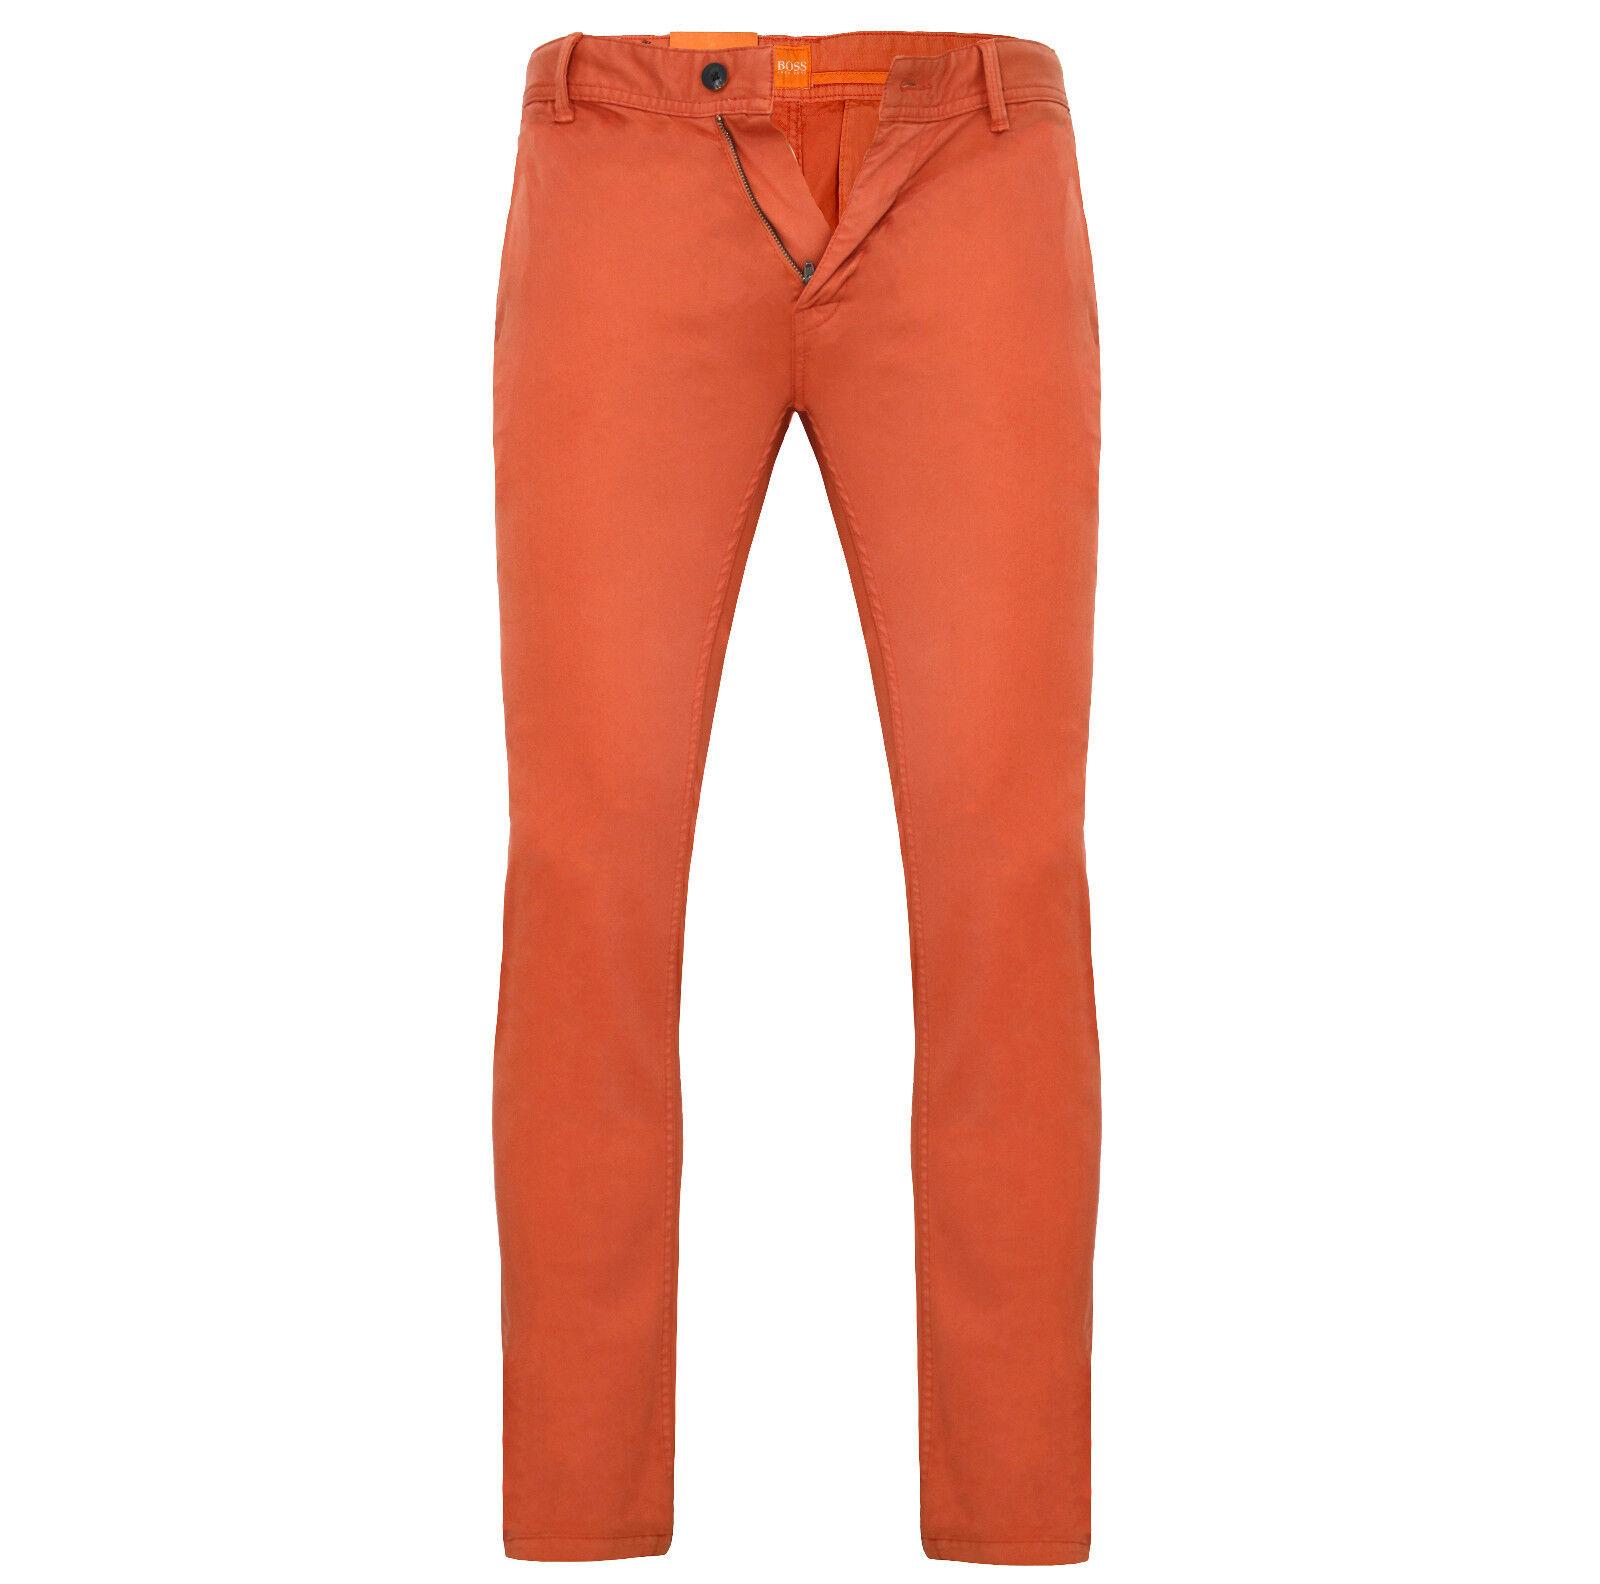 BOSS Orange  Hose Schino-Slim1-D W33 L34 Slim Fit NEU